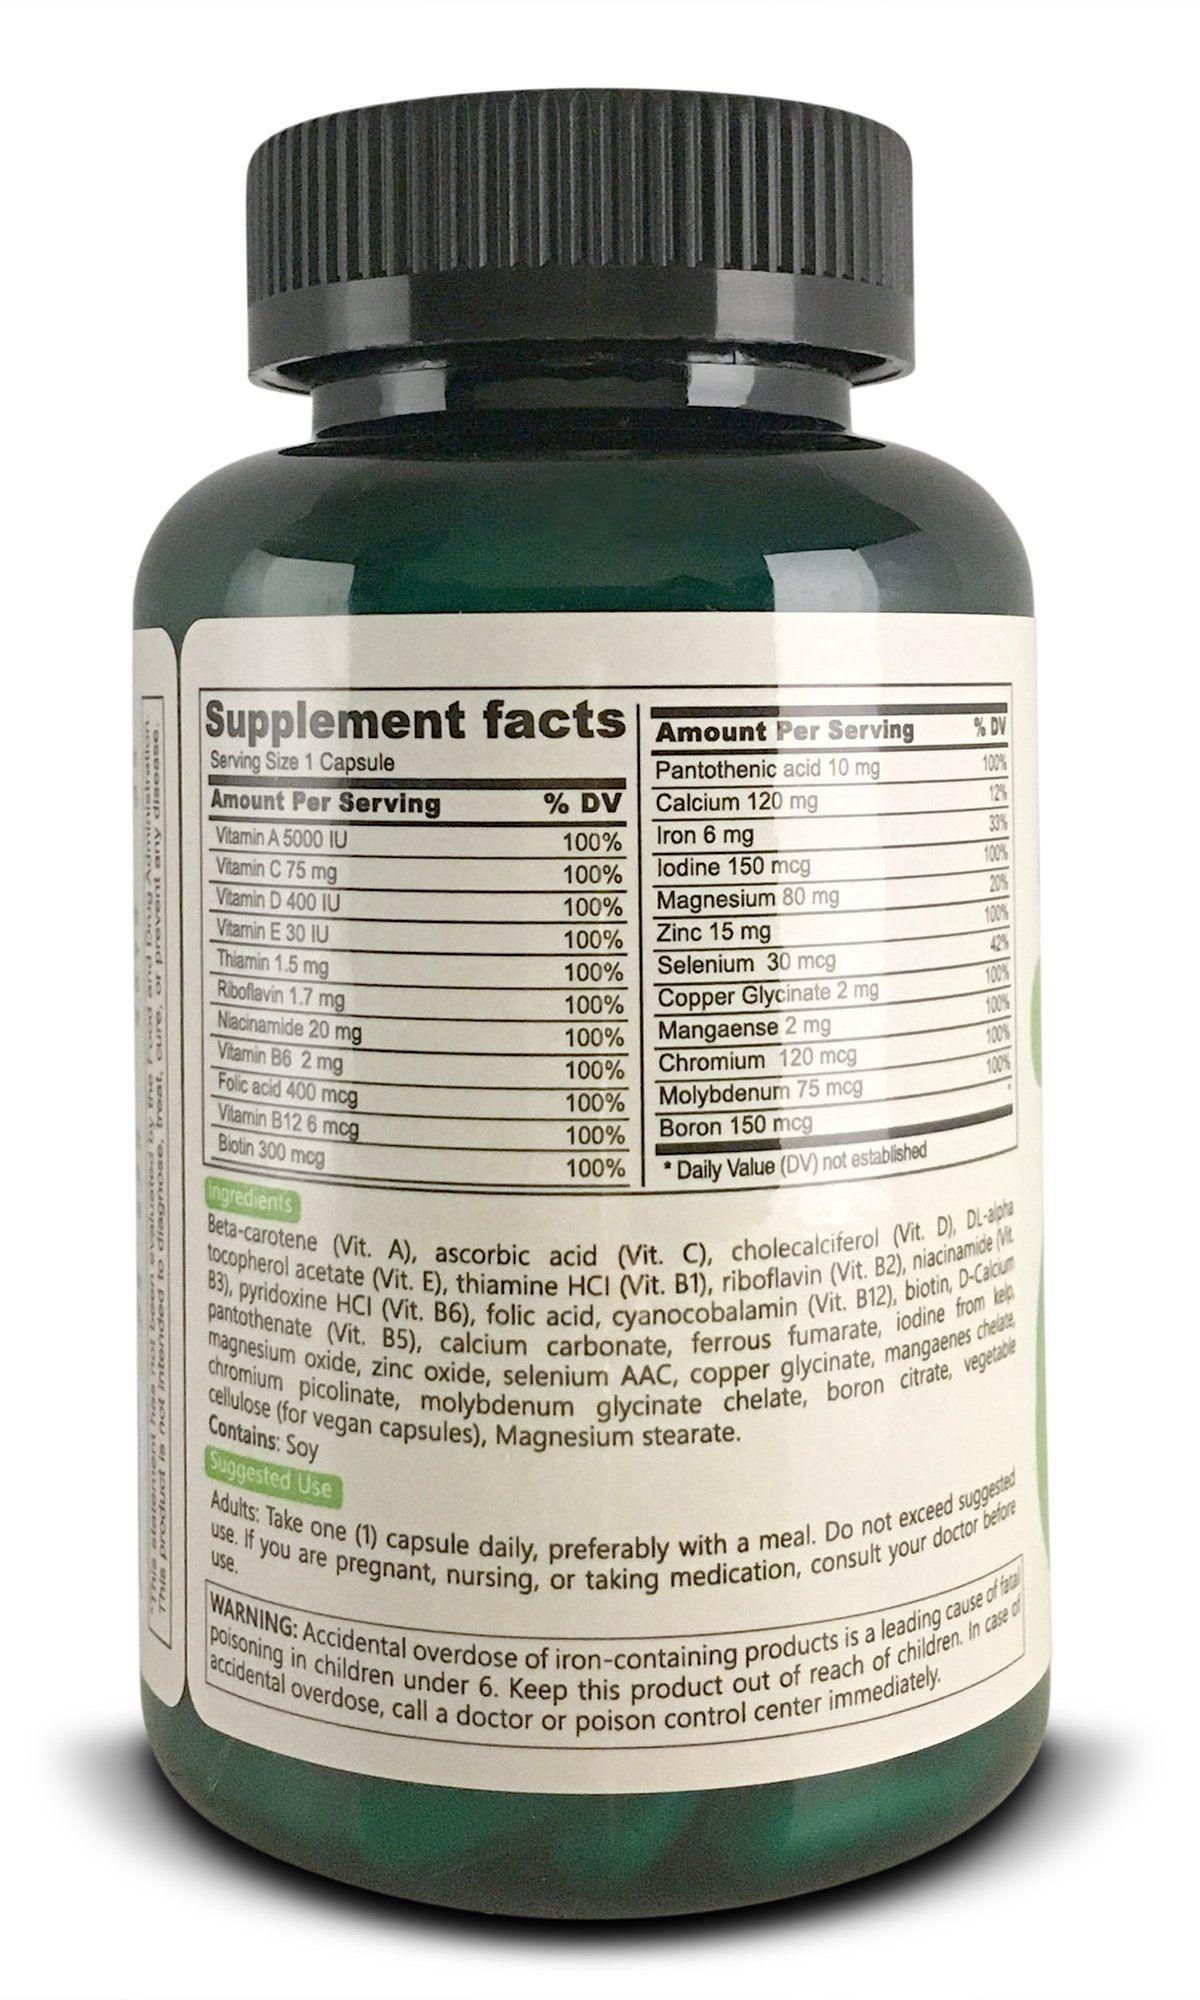 Althymin Multivitamin Multimineral Supplement 180 Vegan Capsules Kosher  Vegetarian Friendly Gluten Wheat Dairy and Sugar Free